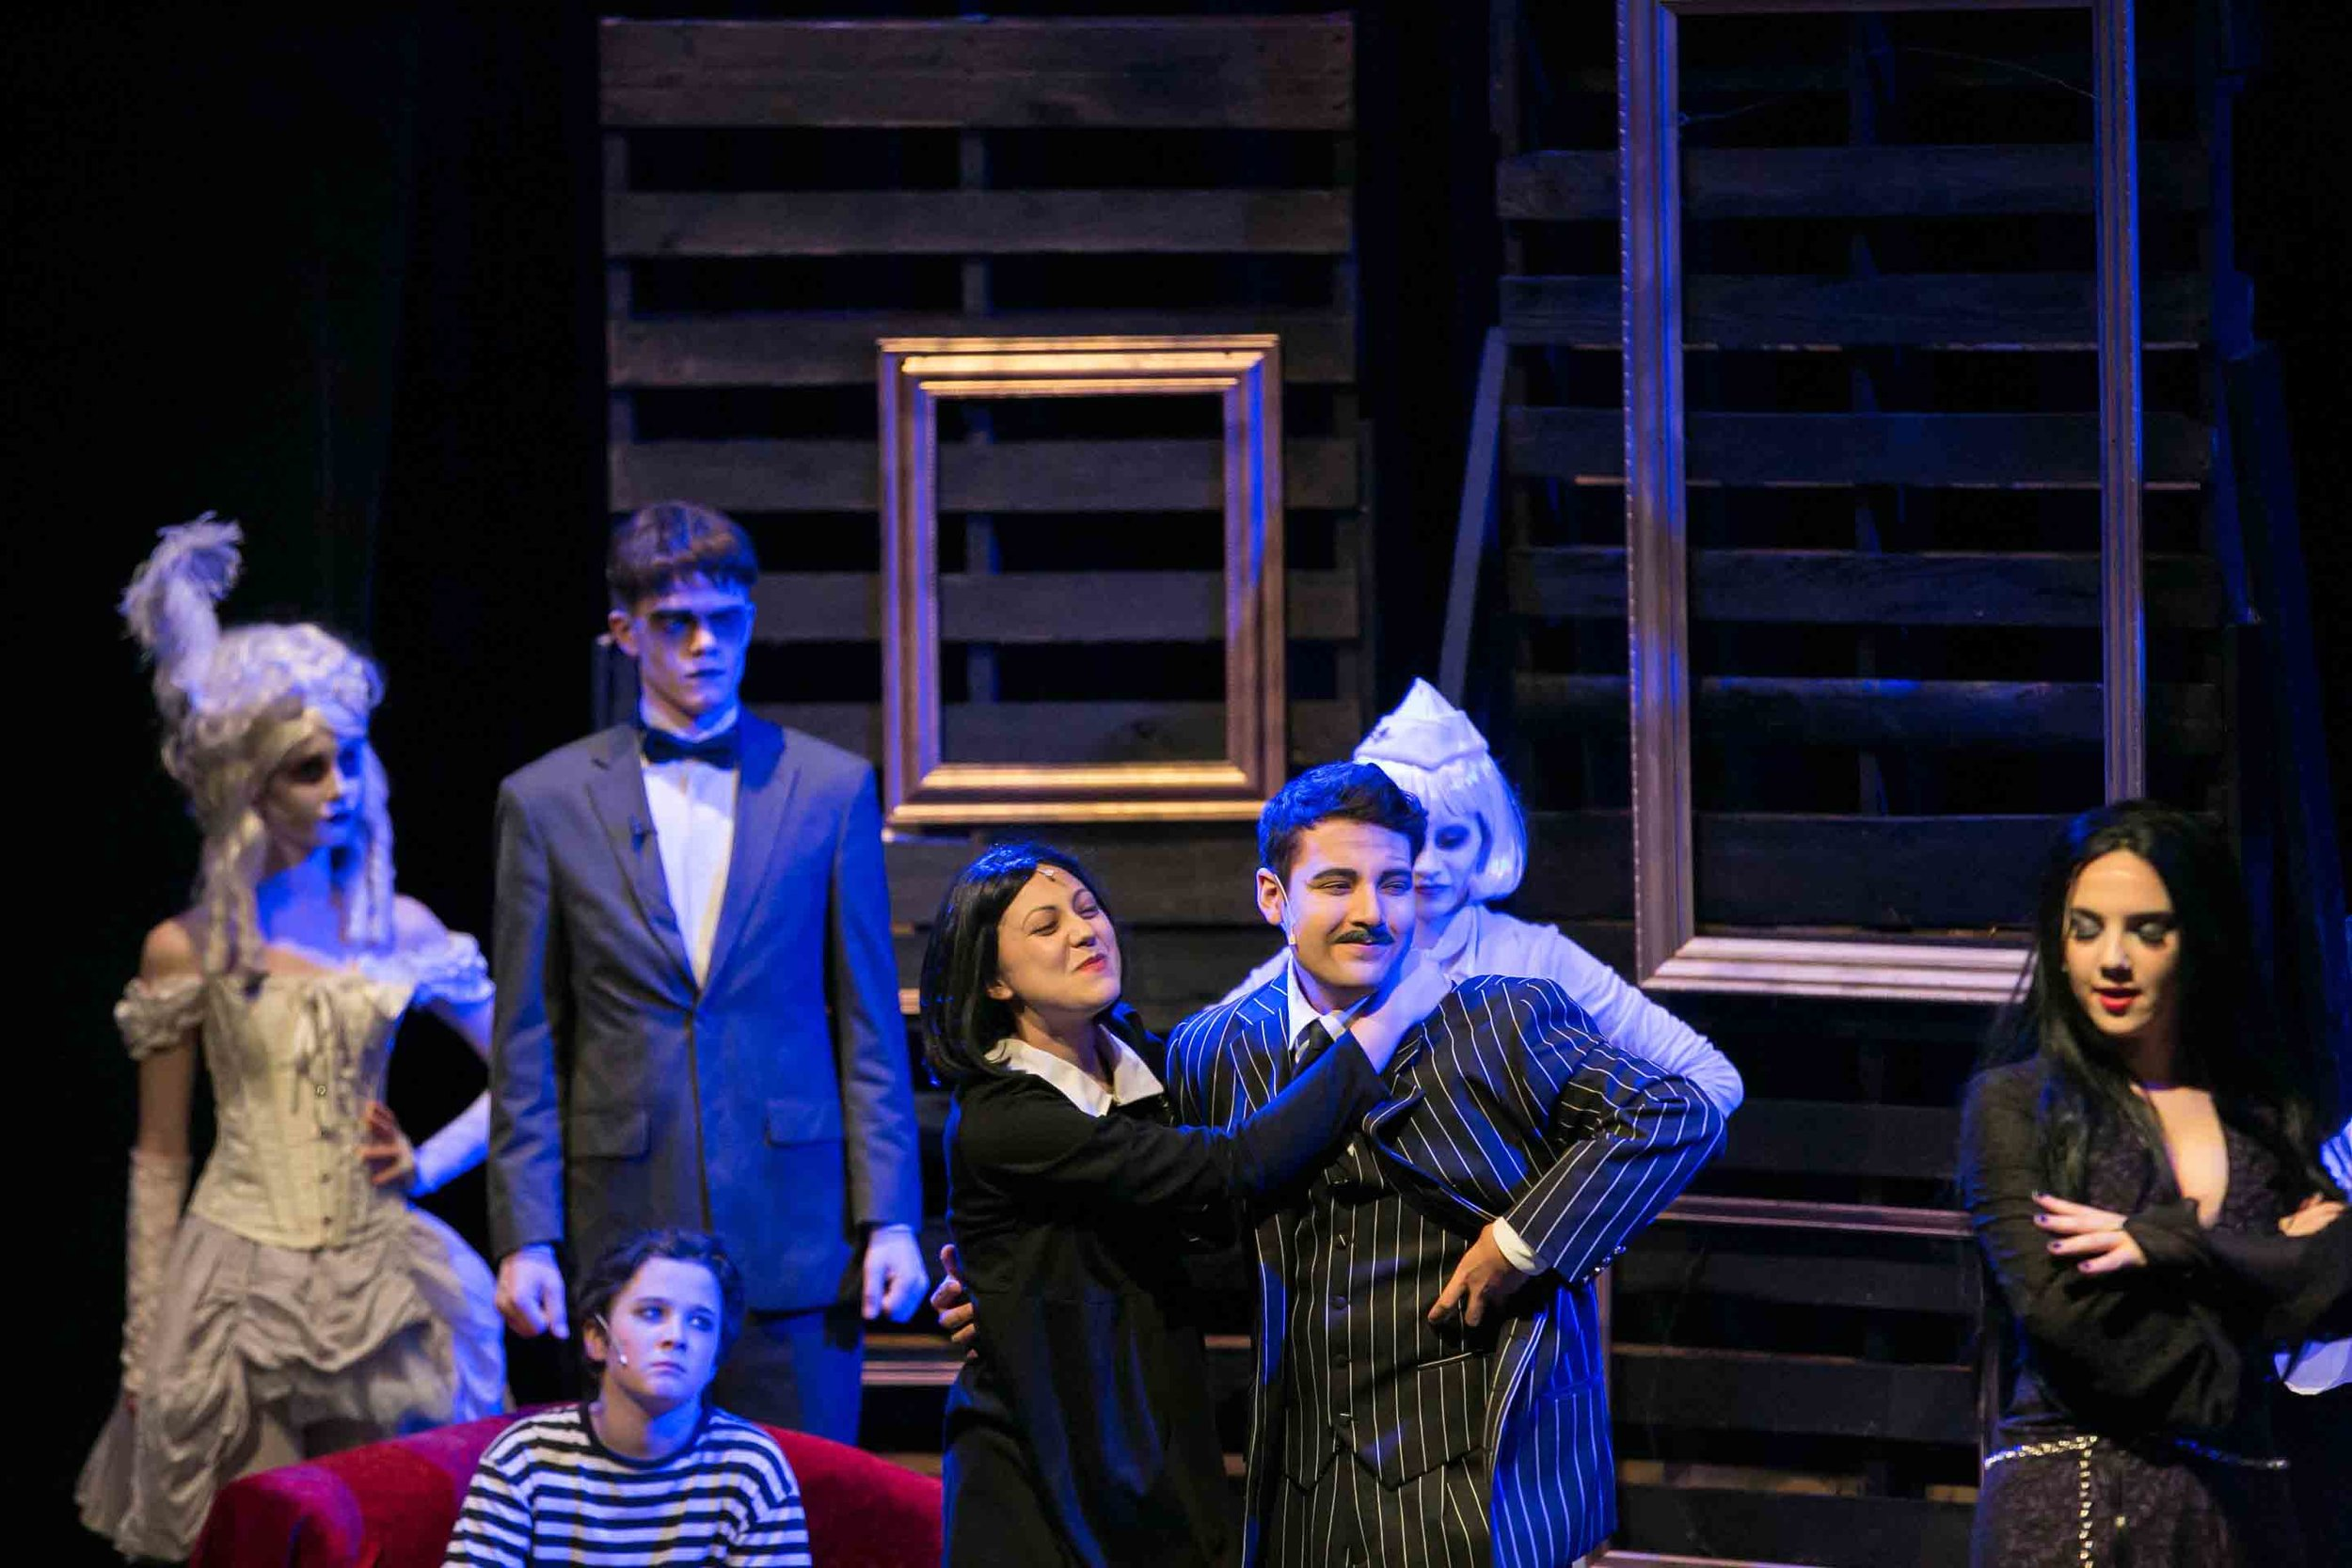 6-19-16 Addams Family Creepy Cast 0089.jpg